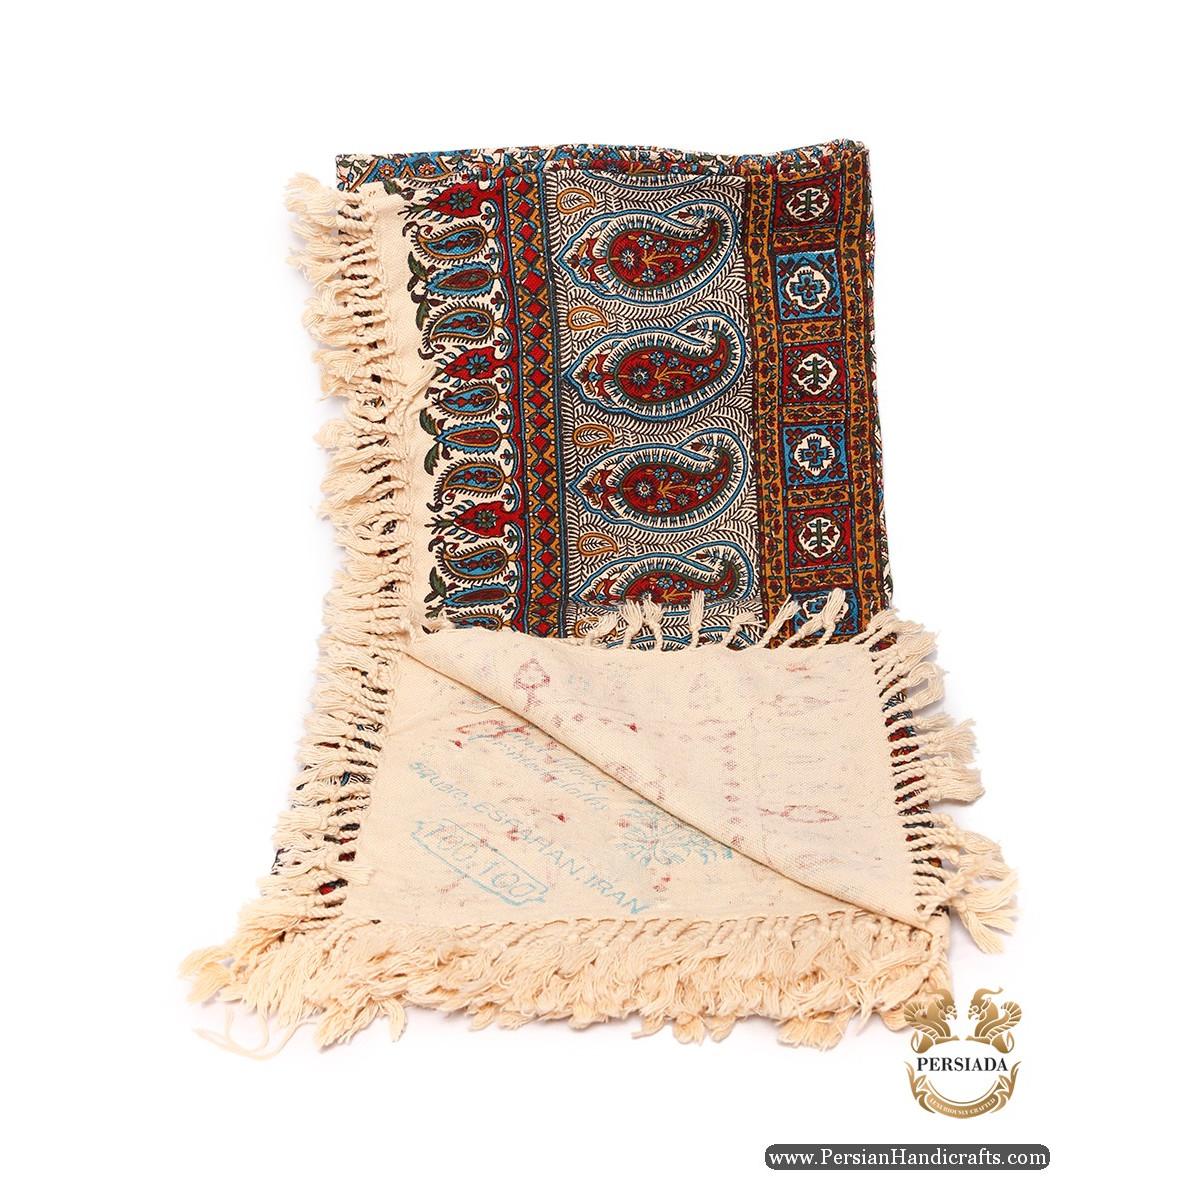 Square Tablecloth   Hand Printed Ghalamkar   Persiada HGH6104